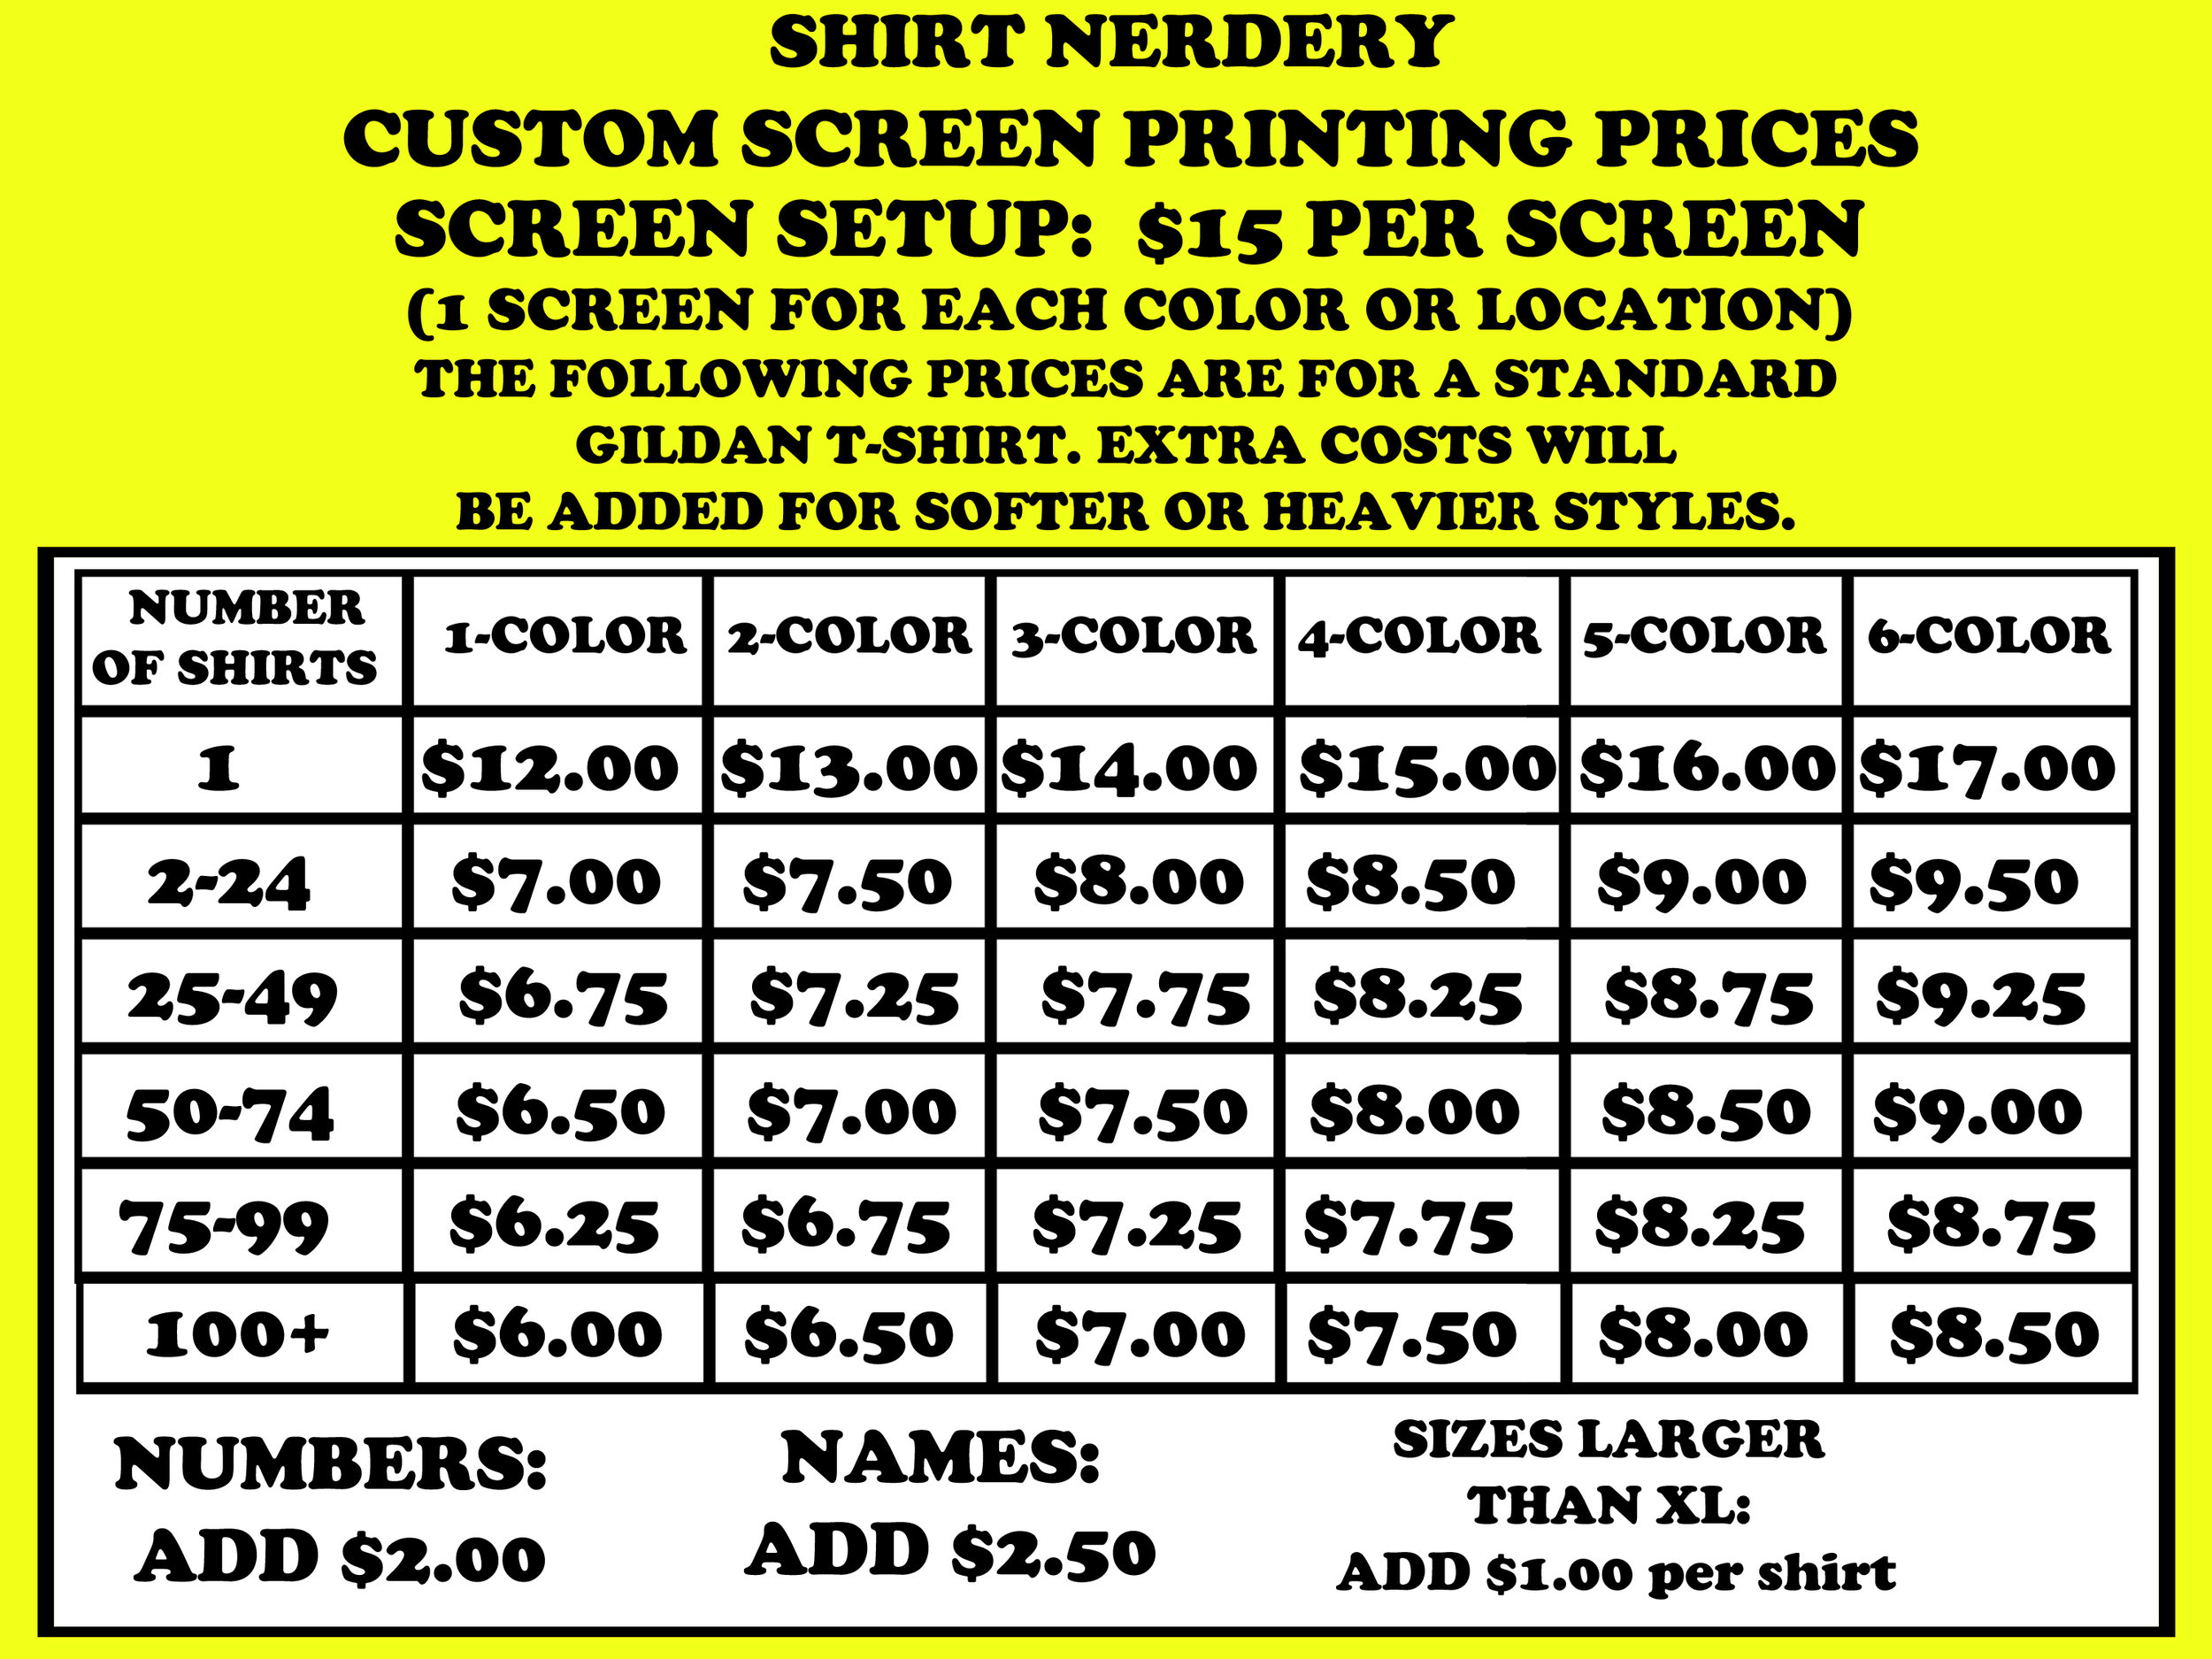 Shirt Nerdery Price Sheet 2019.jpg